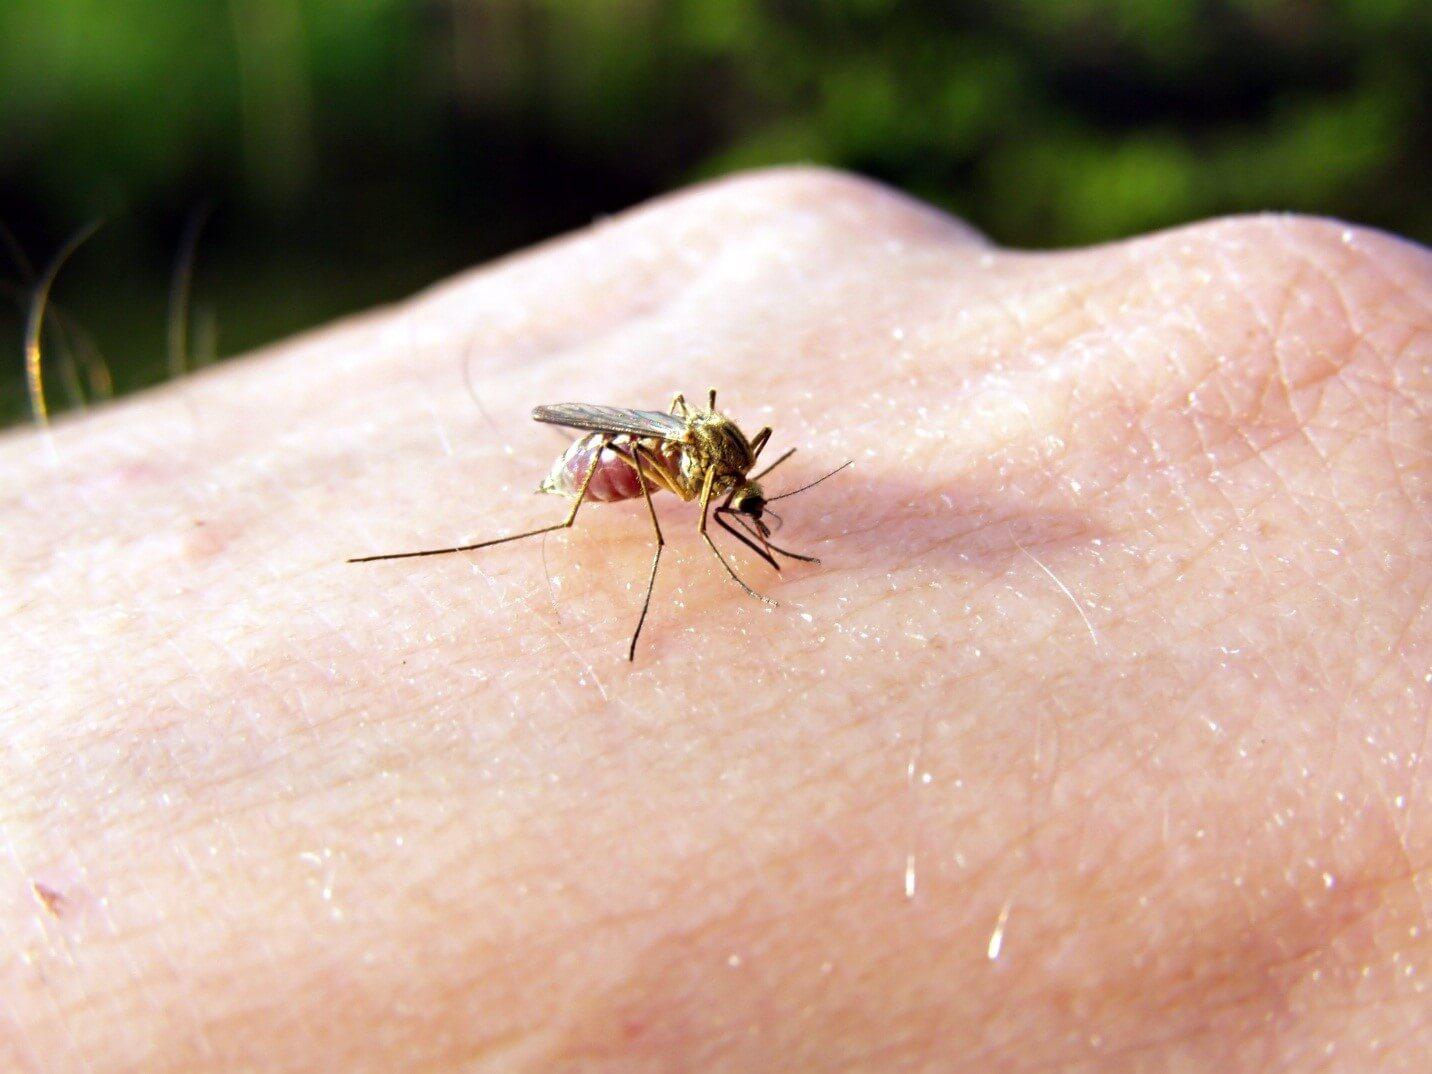 Chigger Bites Vs Bed Bug Bites